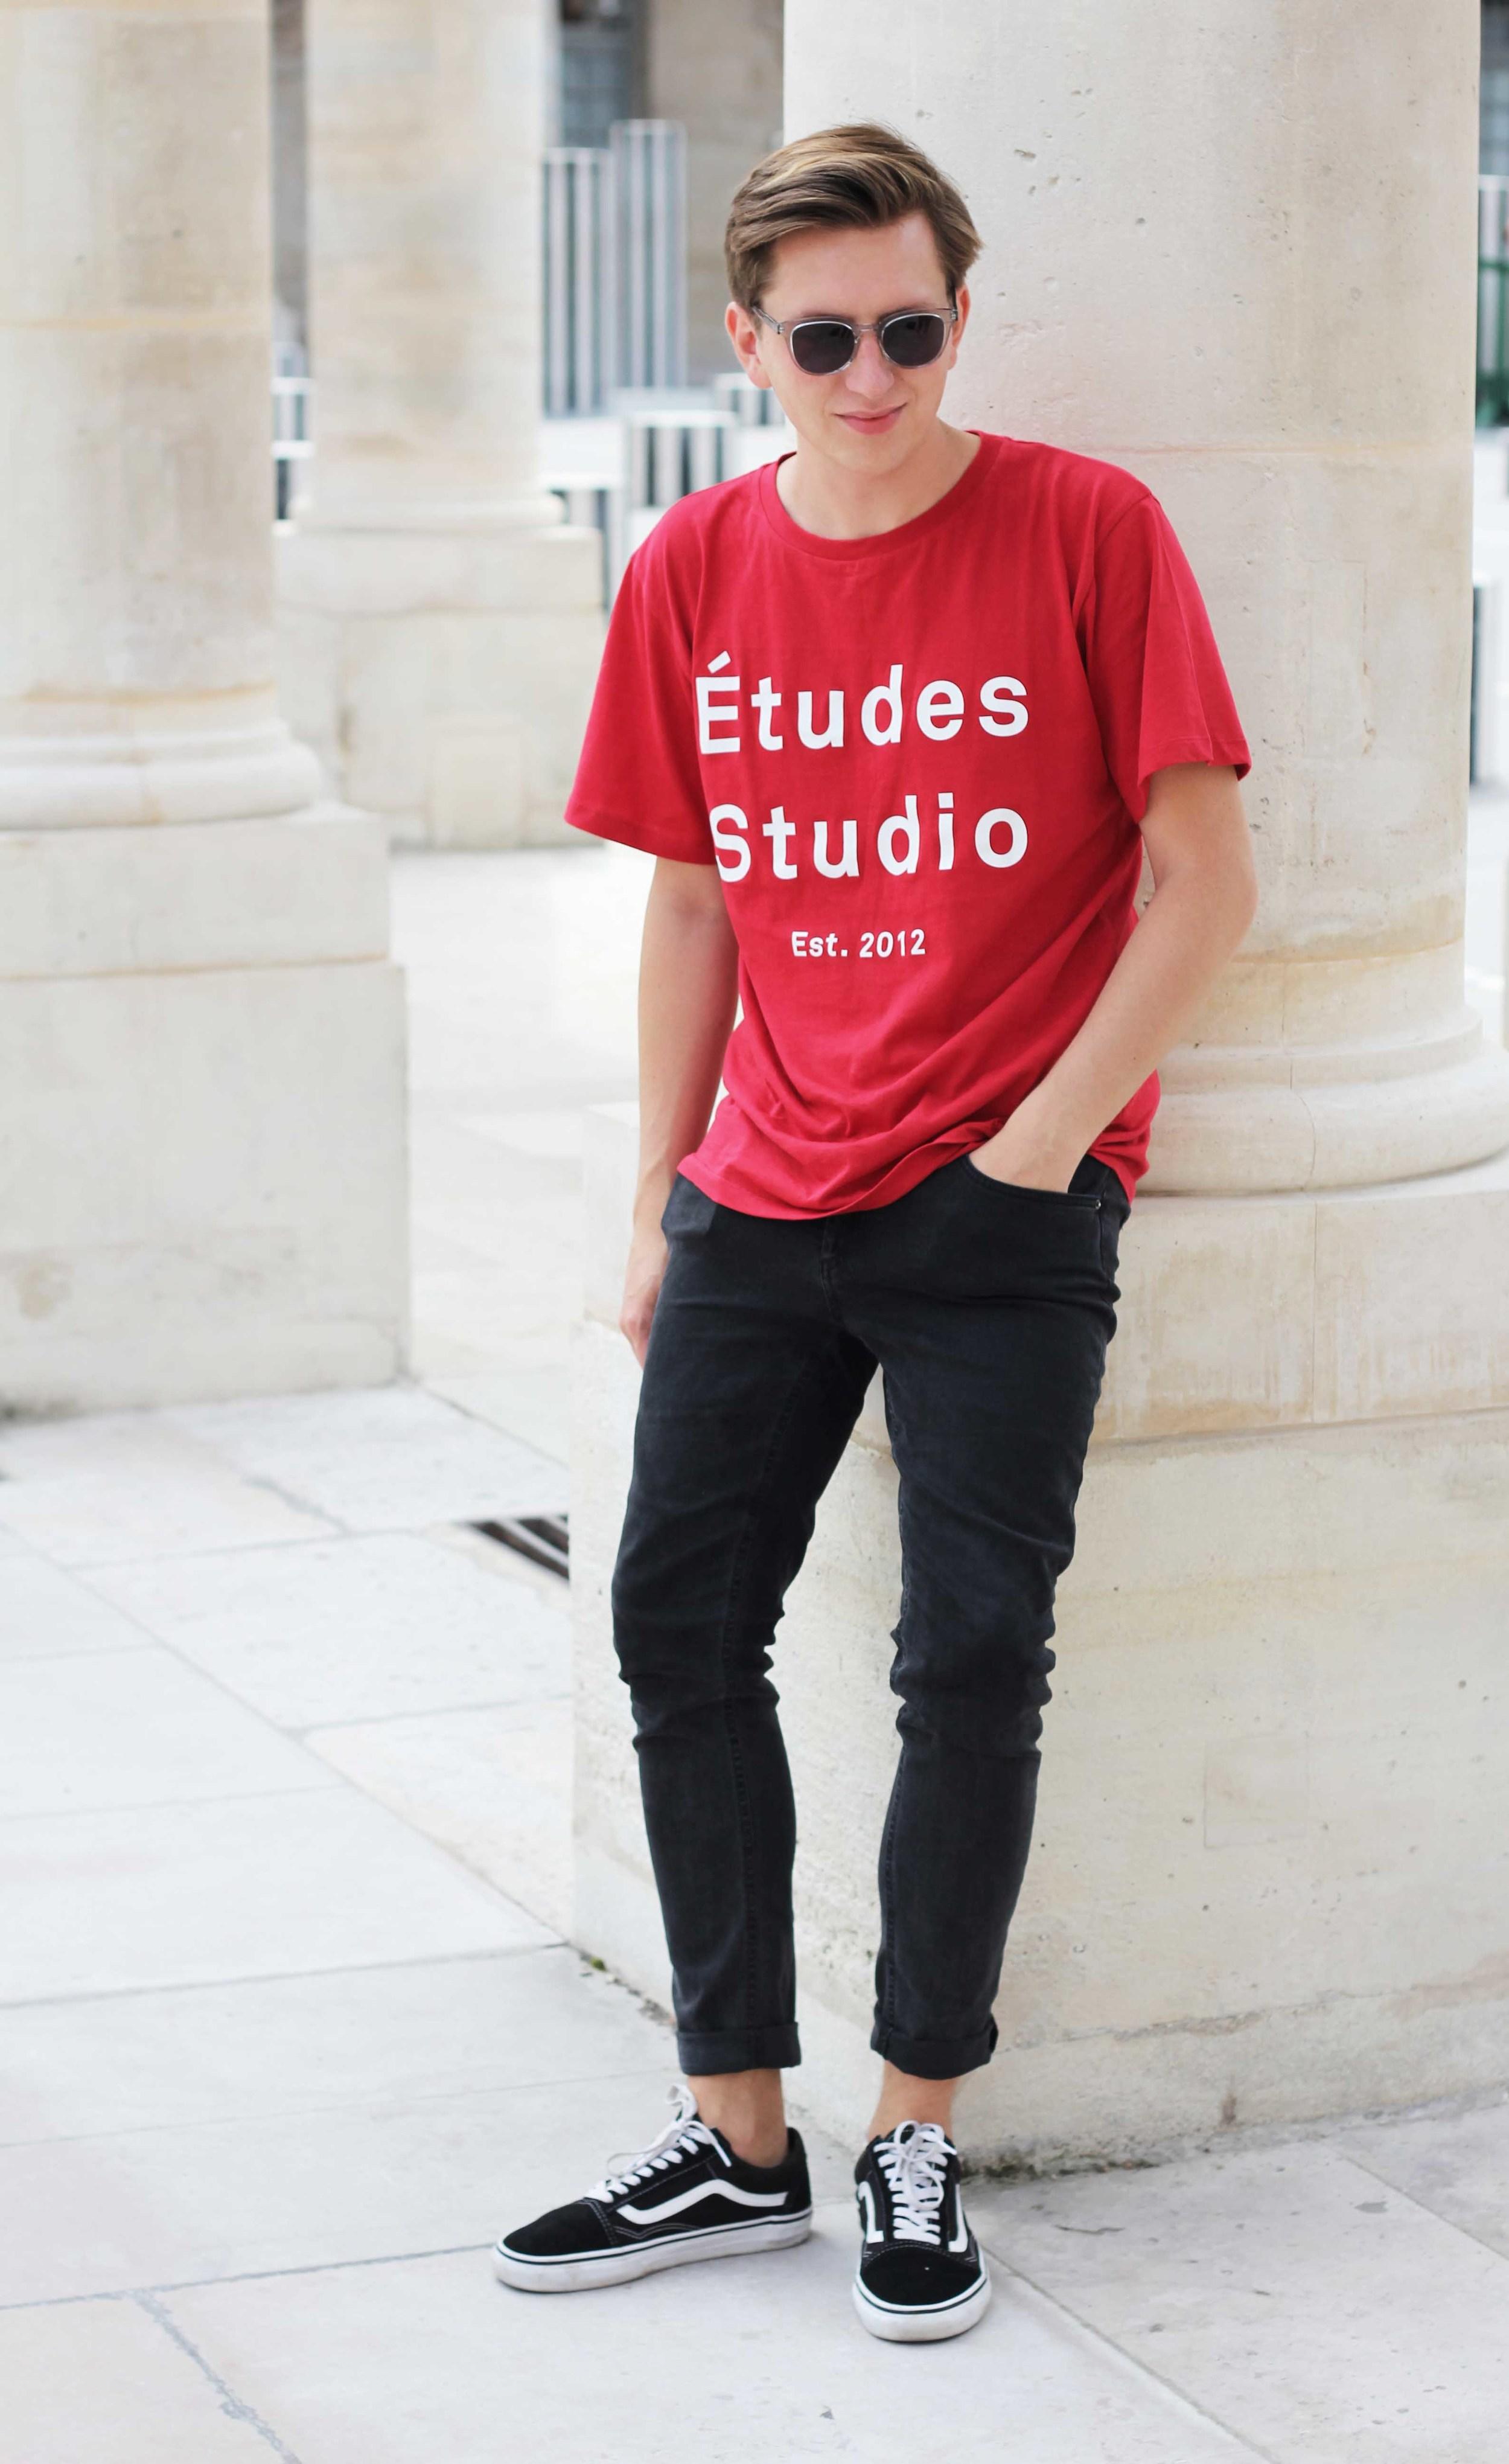 etudes_studio_paris_france_ootd